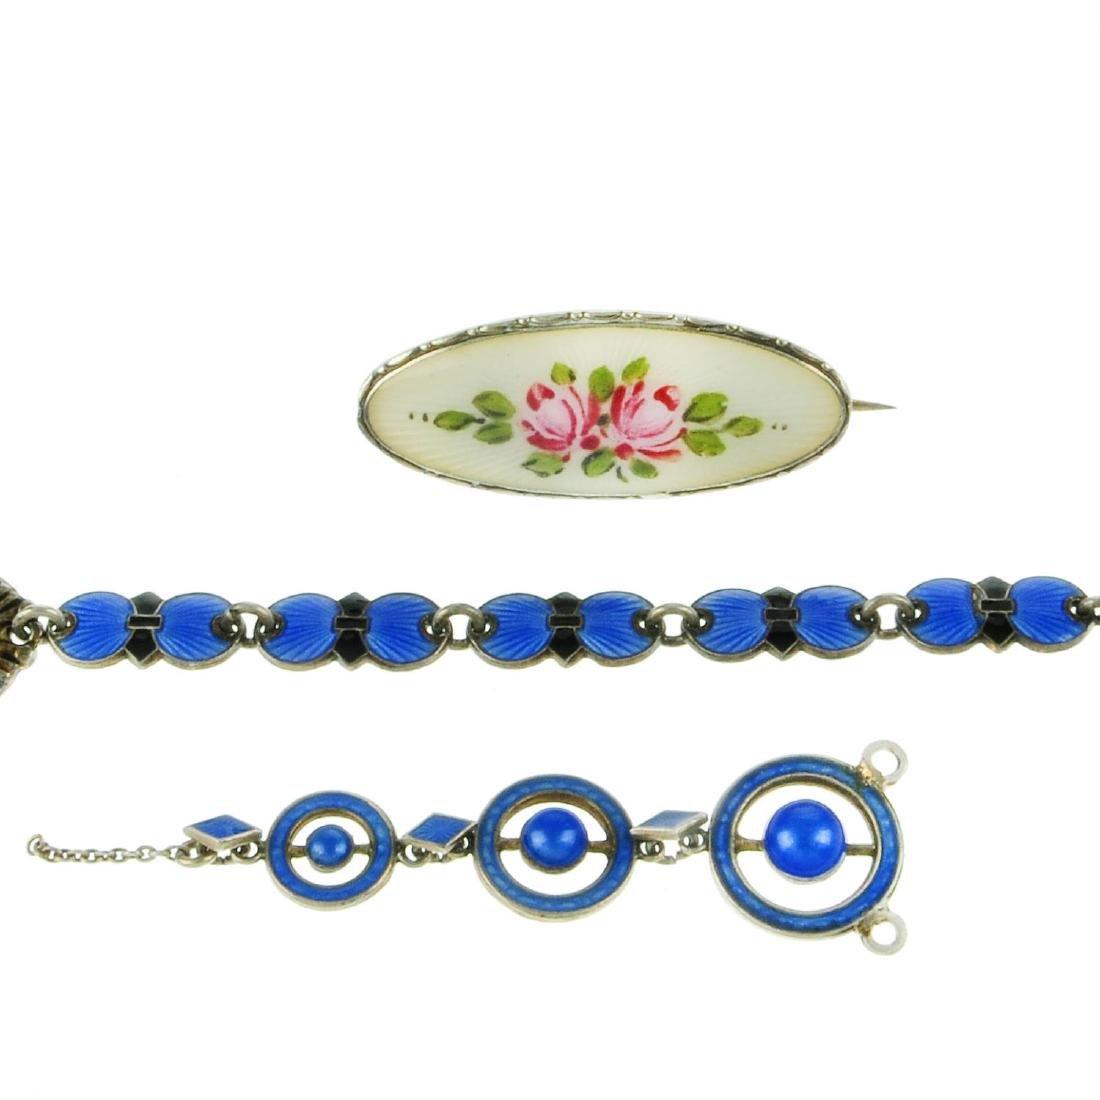 Three Scandinavian enamel items of jewellery. The first